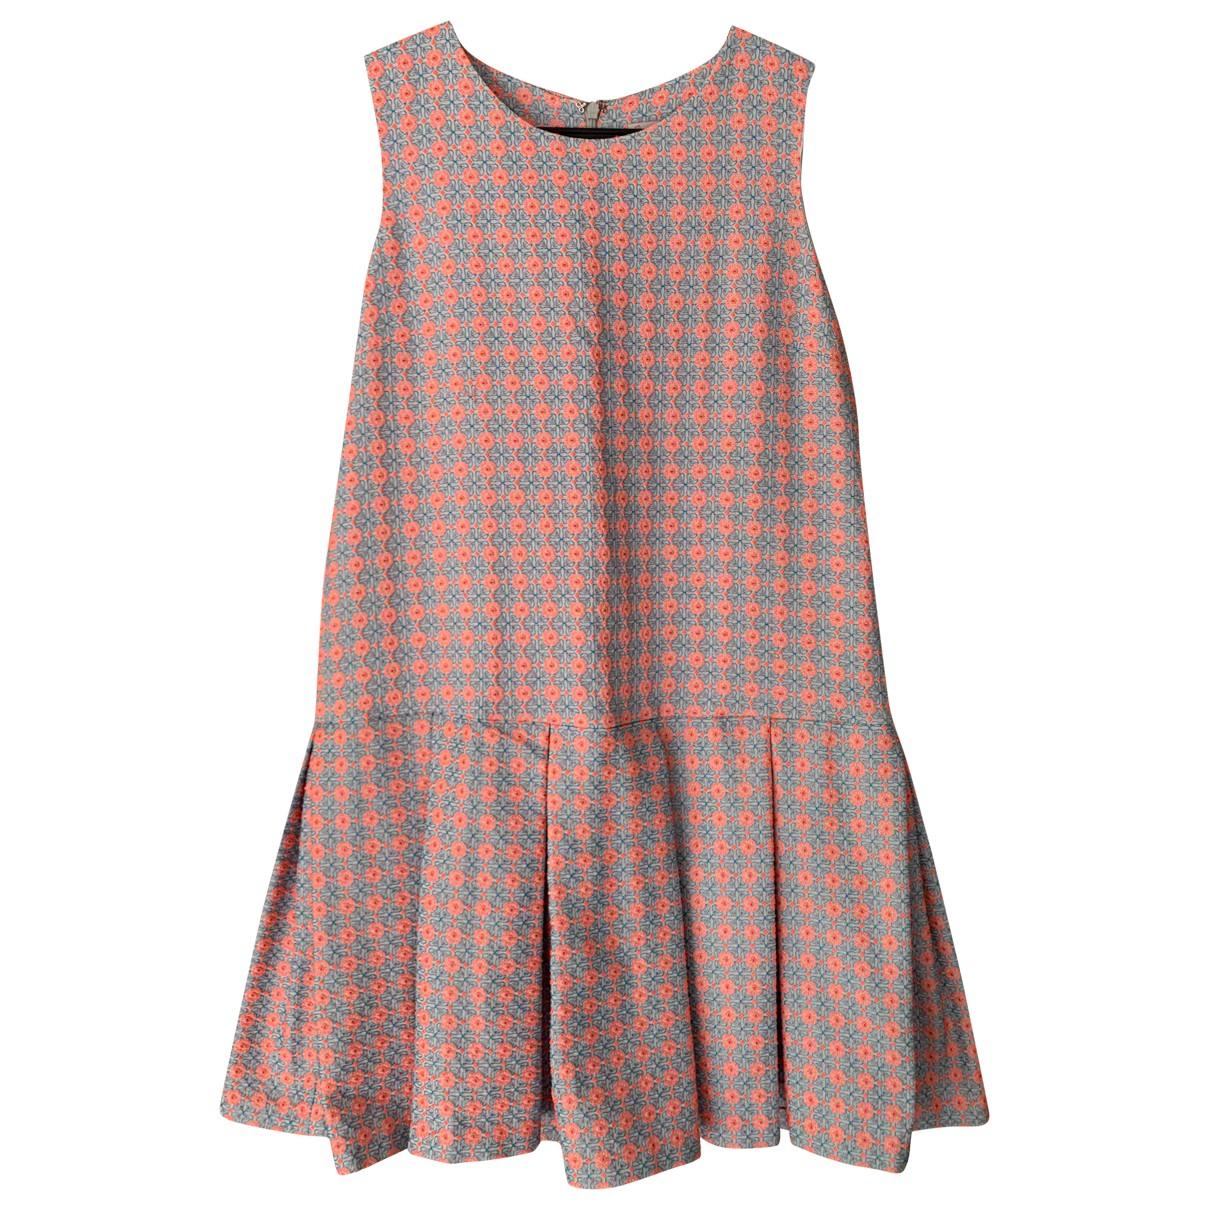 Paul & Joe \N Pink dress for Women 12 UK